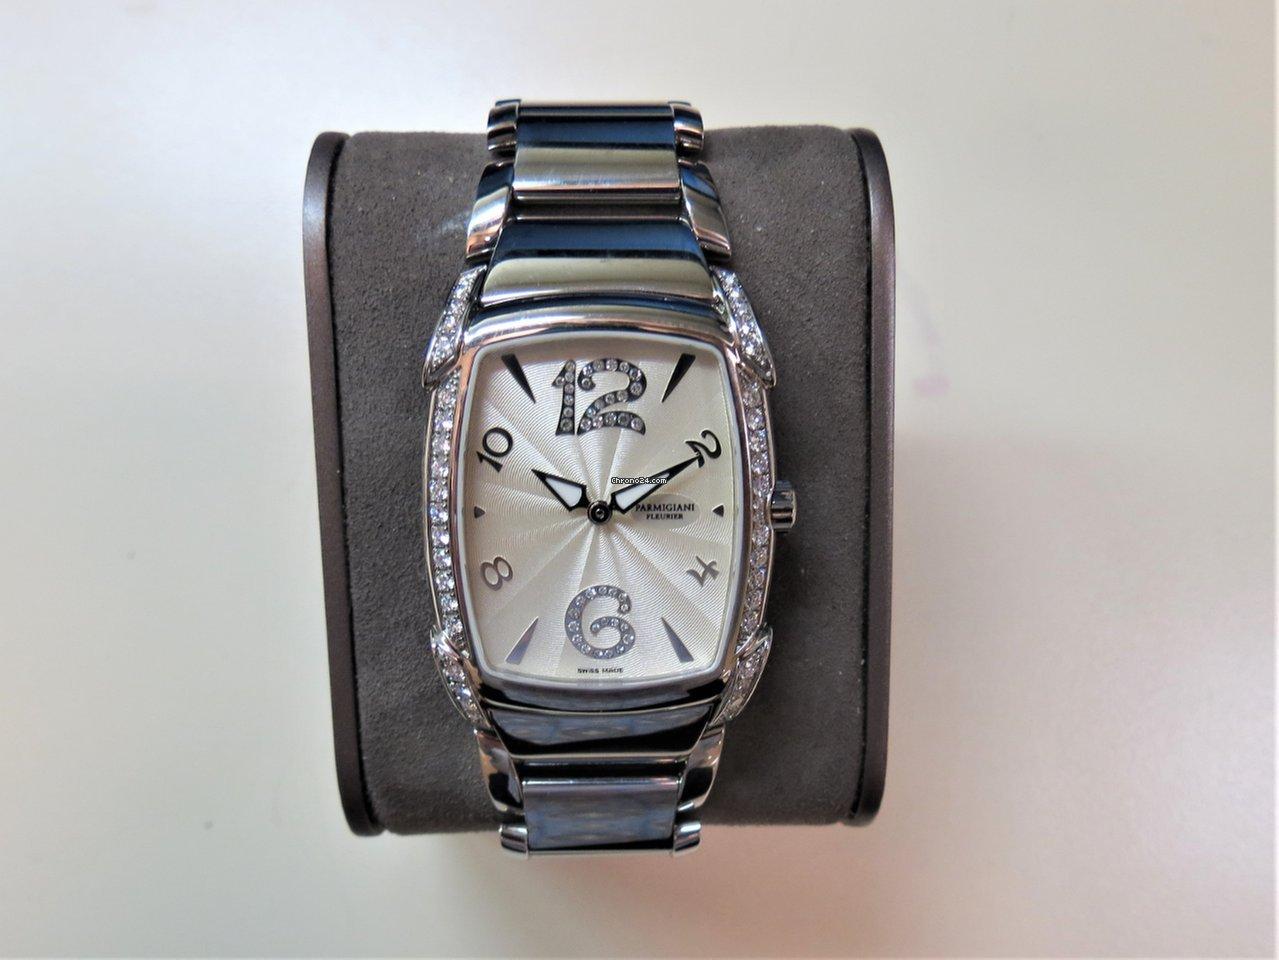 781760a56fe Prices for Parmigiani Fleurier Kalpa watches